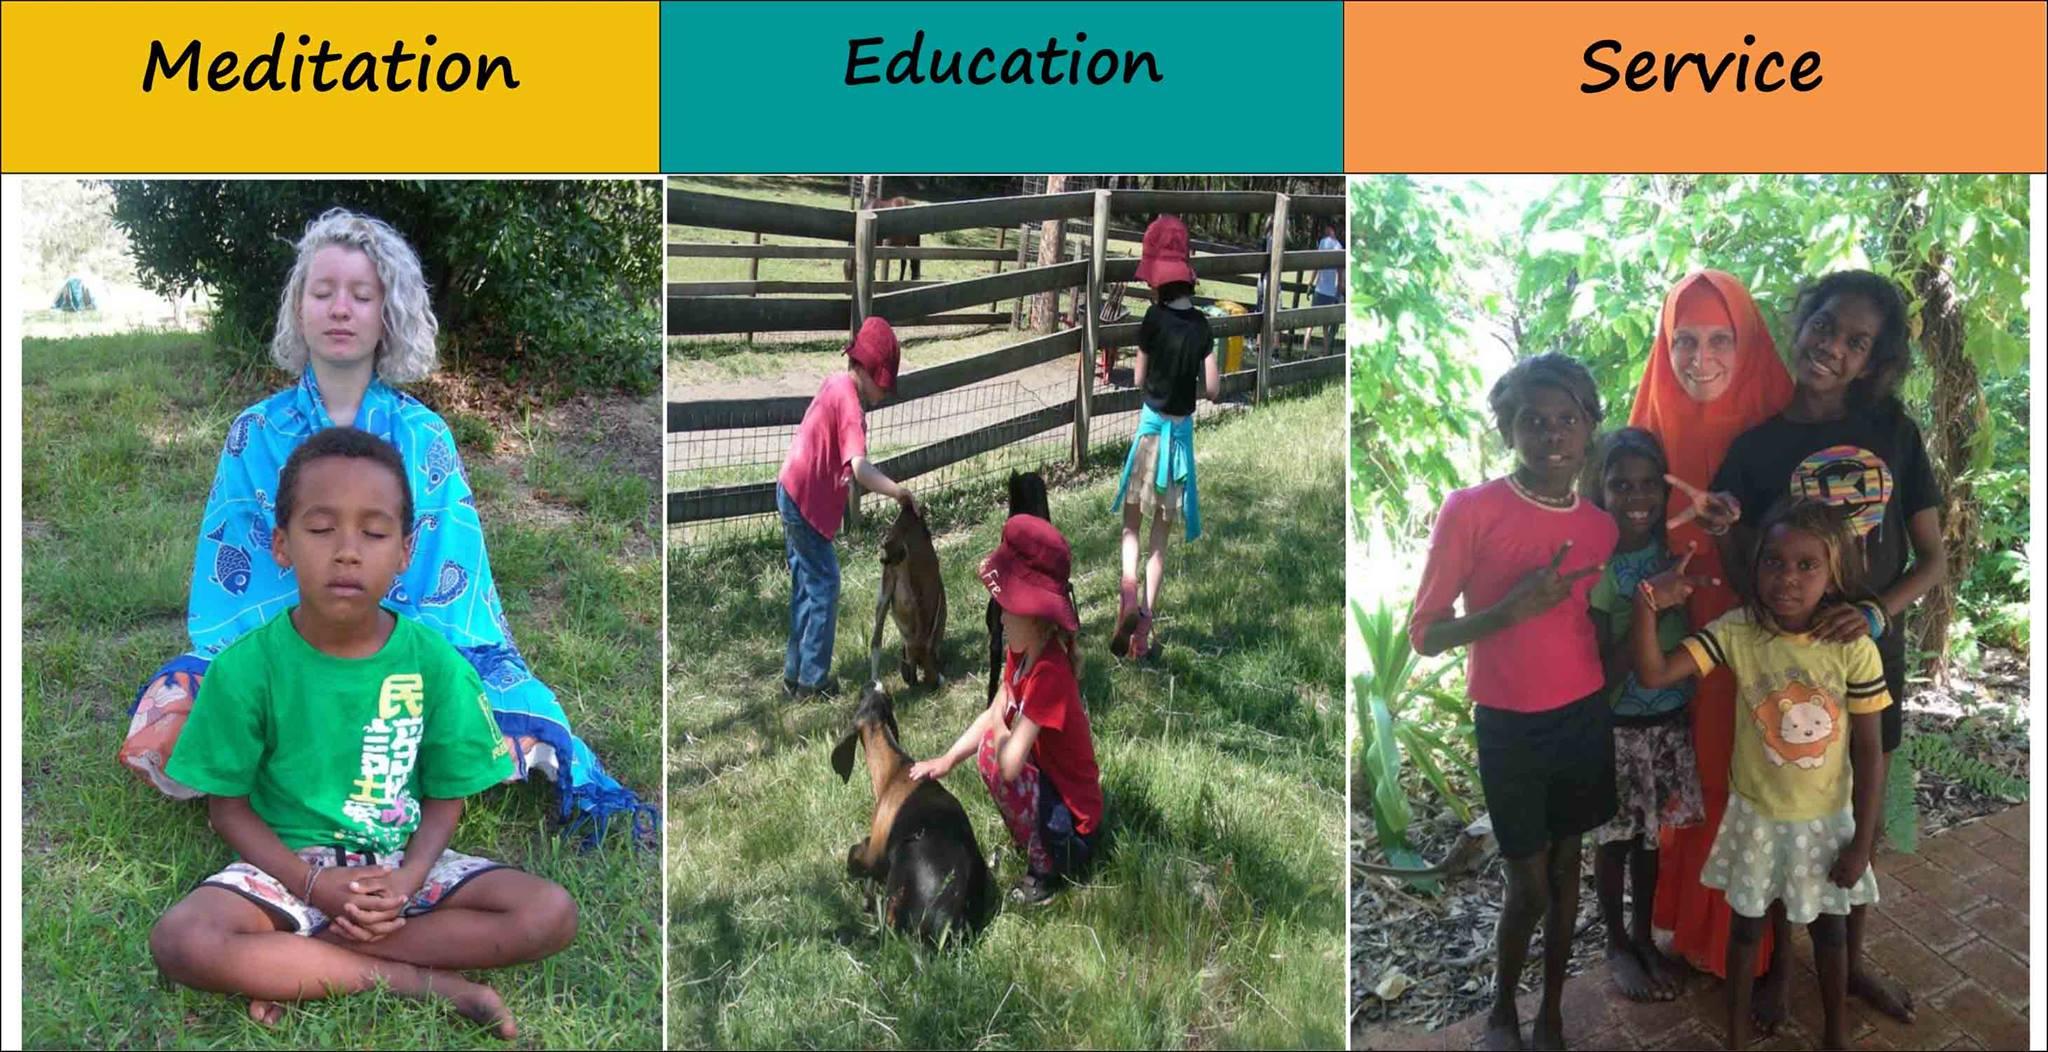 ananda-marga-meditation-center-katoomba-new-south-wales-7